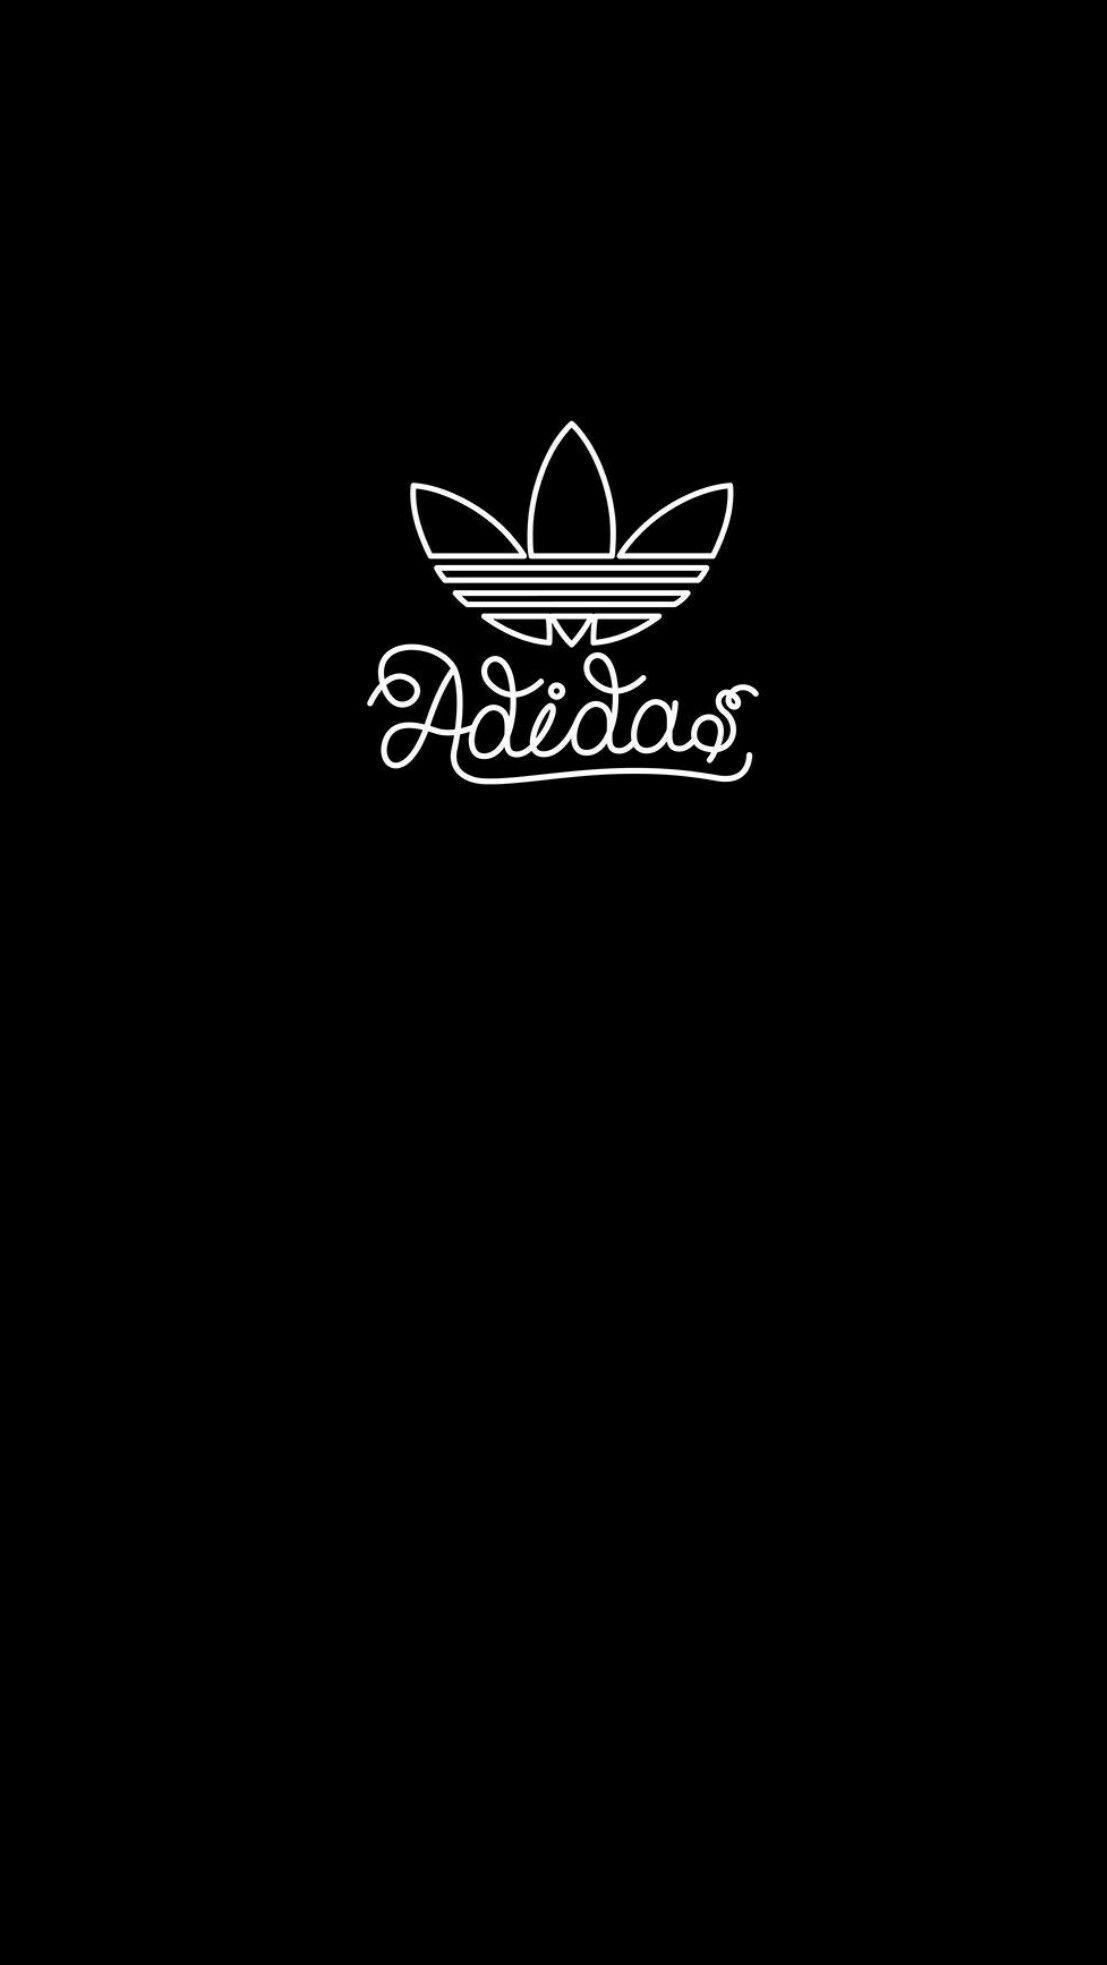 Adidas Camouflage Wallpaper Iphone Android アディダス壁紙 Adidas ロゴ 壁紙 Iphone おしゃれ